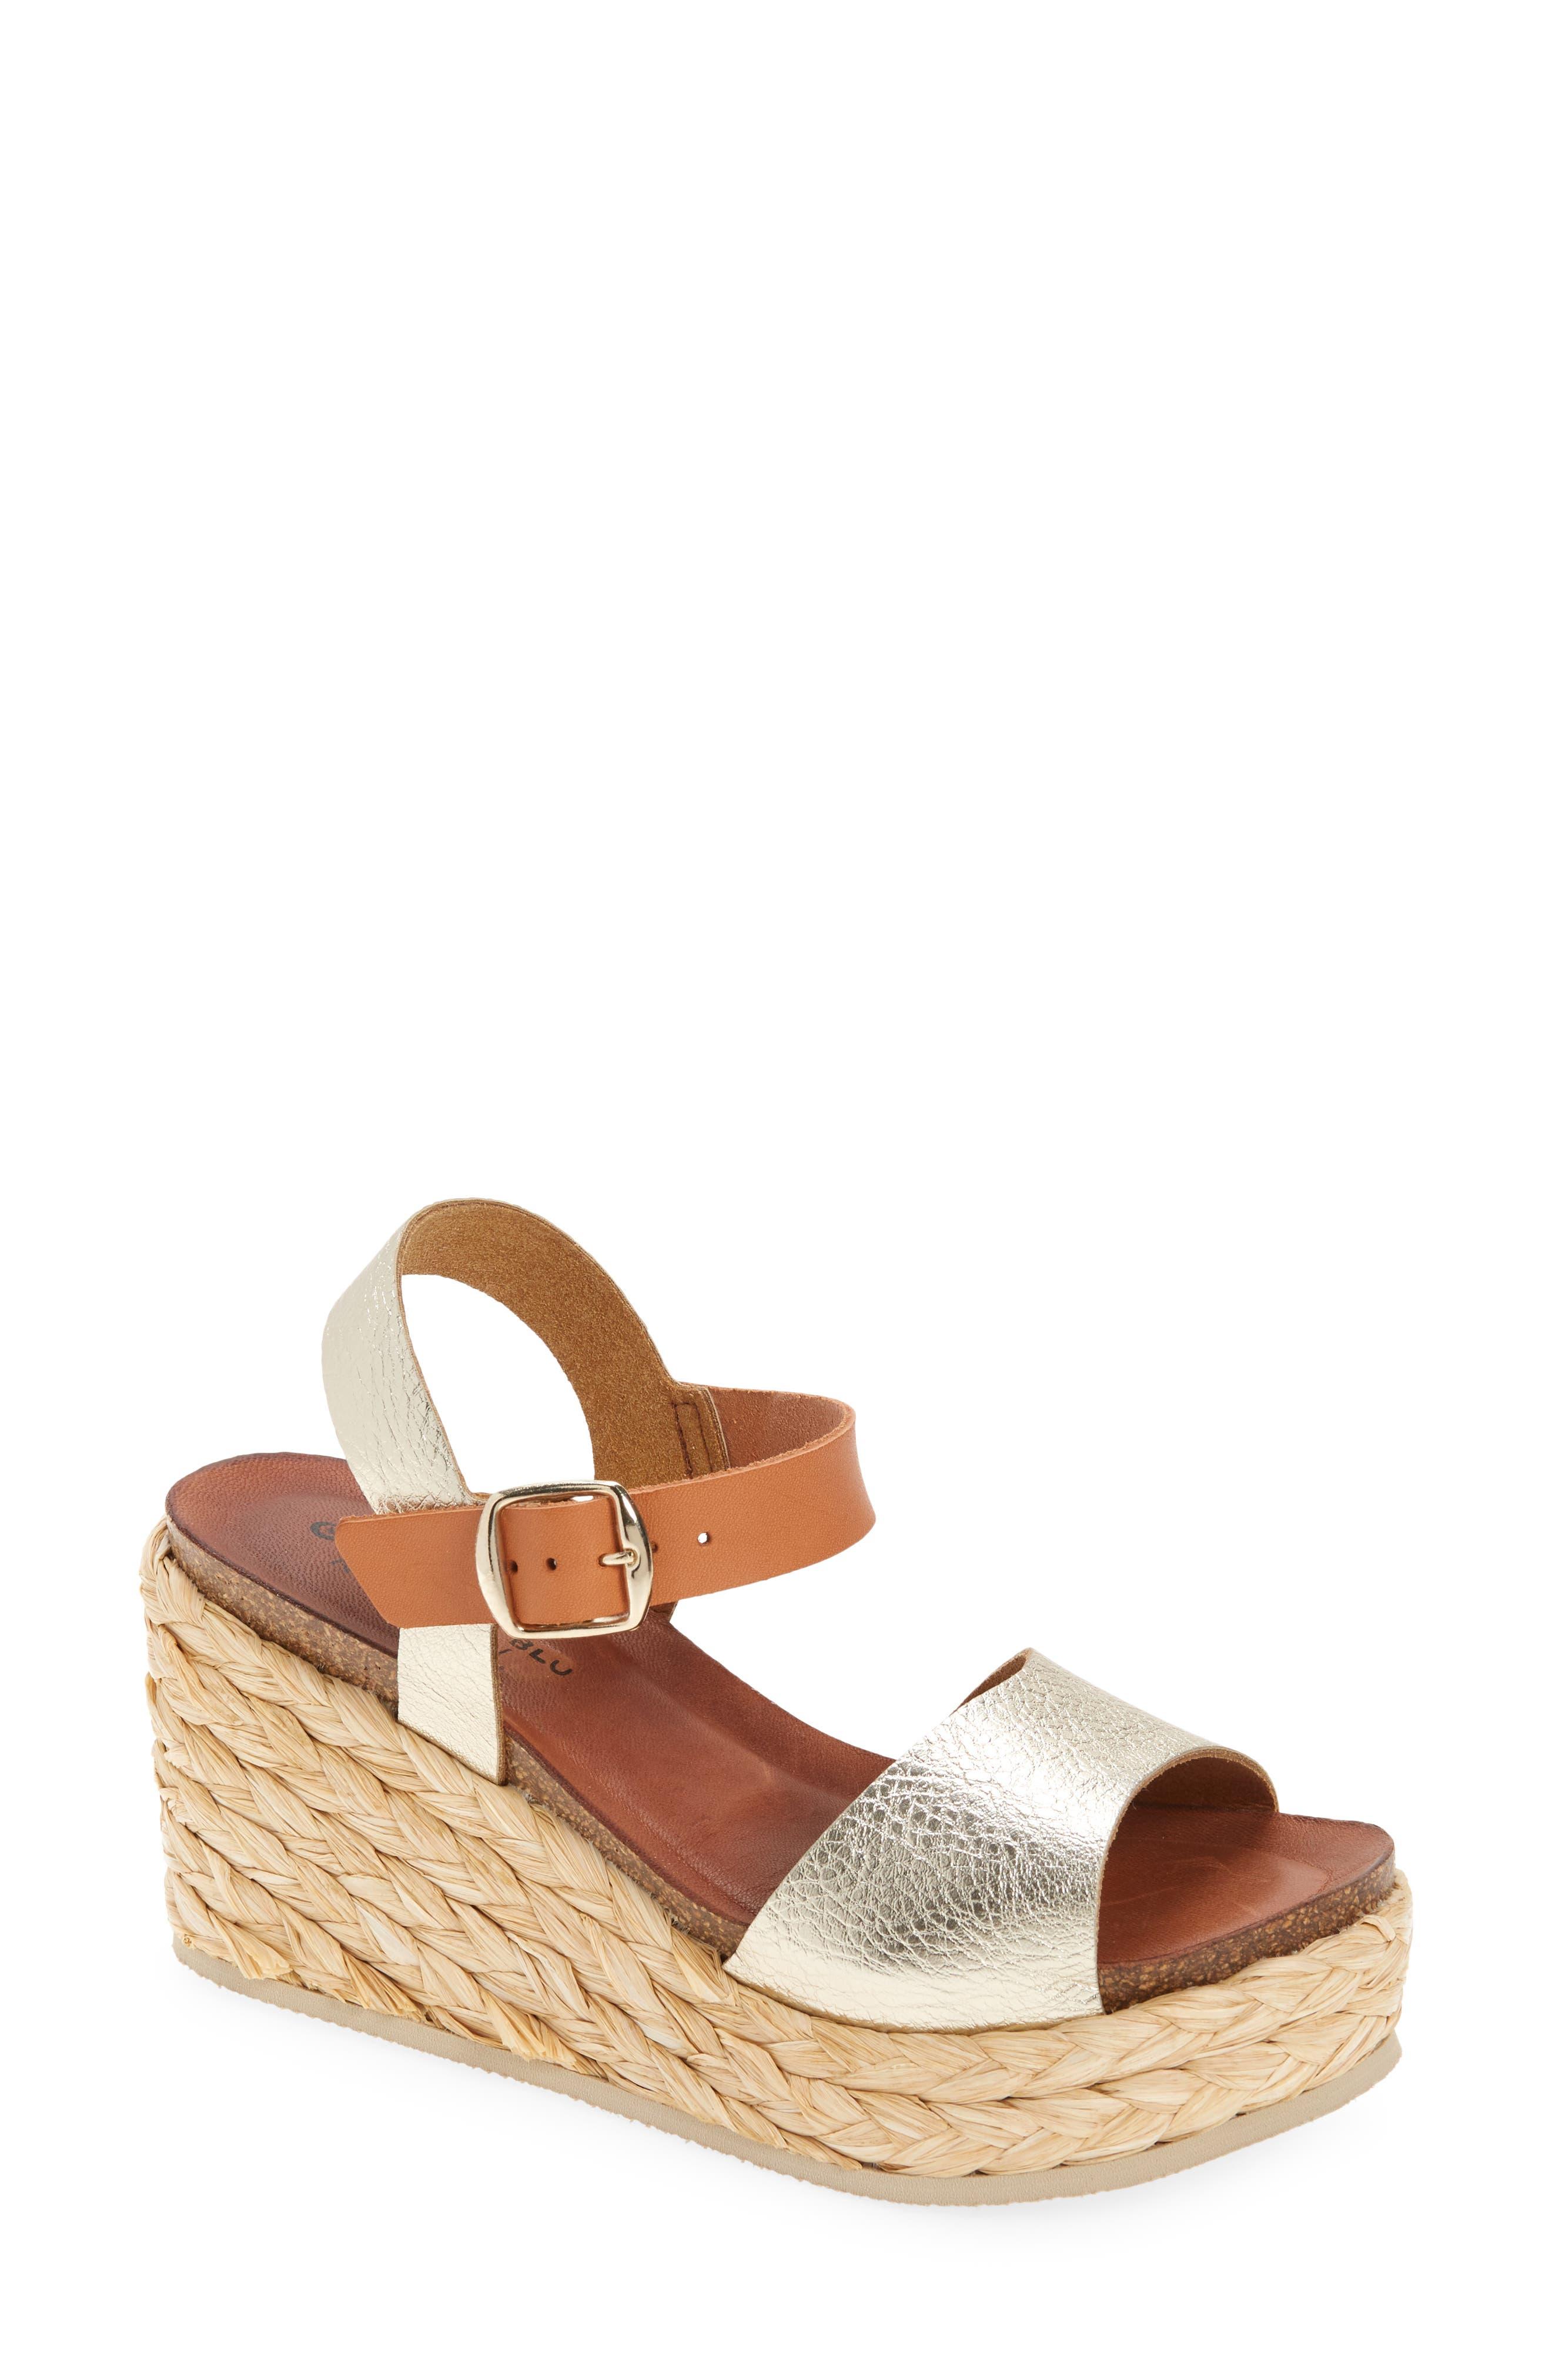 Mira Espadrille Wedge Sandal